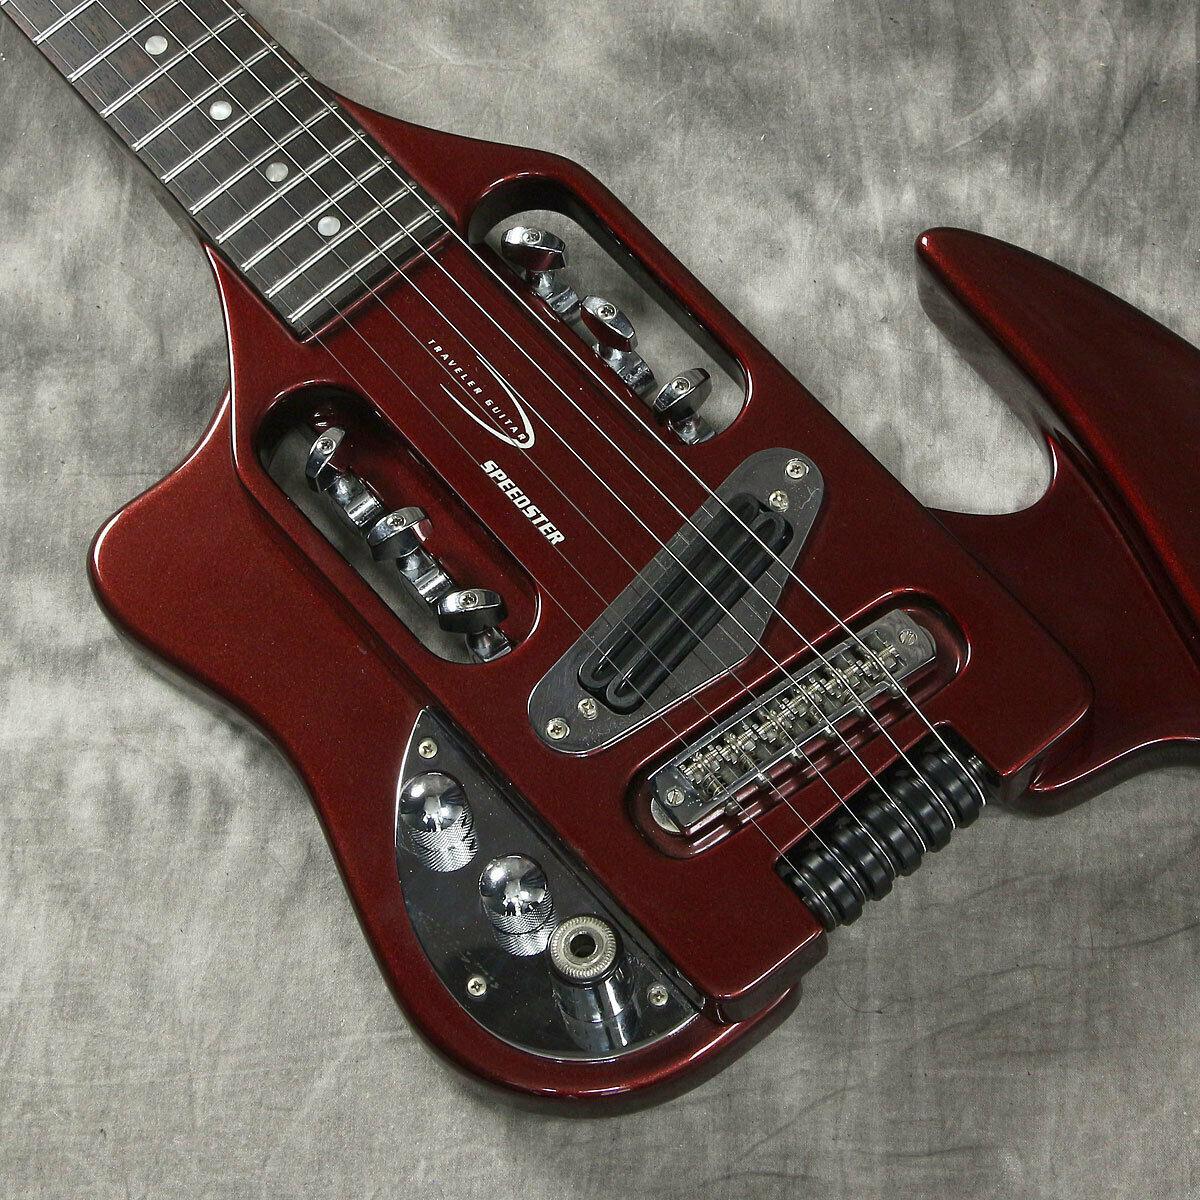 Traveler Guitar Speedstar rot LH Japan rare beautiful vintage popular EMS F   S